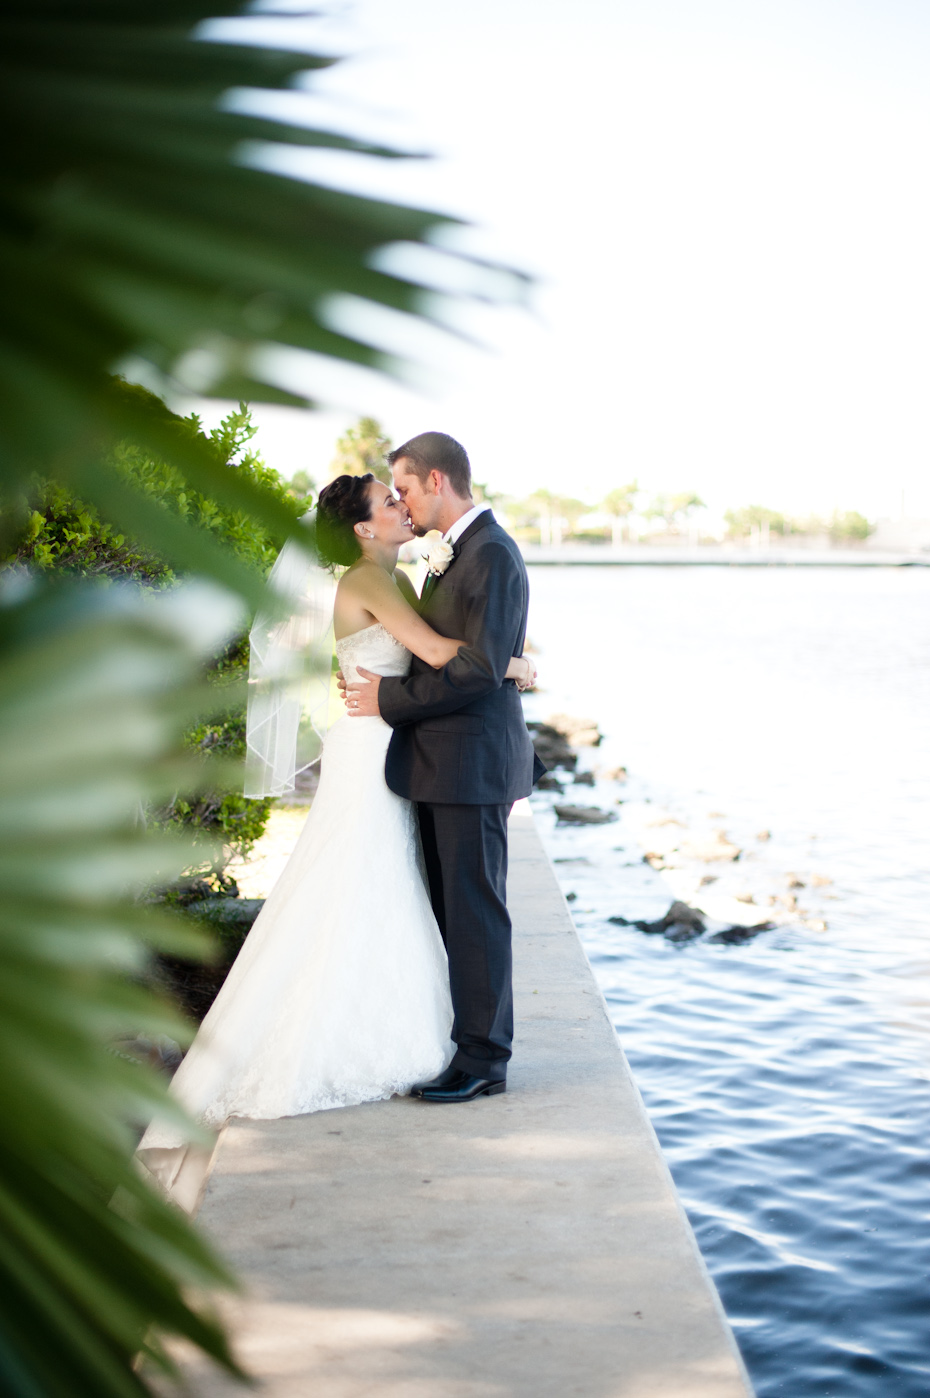 west palm beach wedding photographers tj bryan On wedding photographers west palm beach